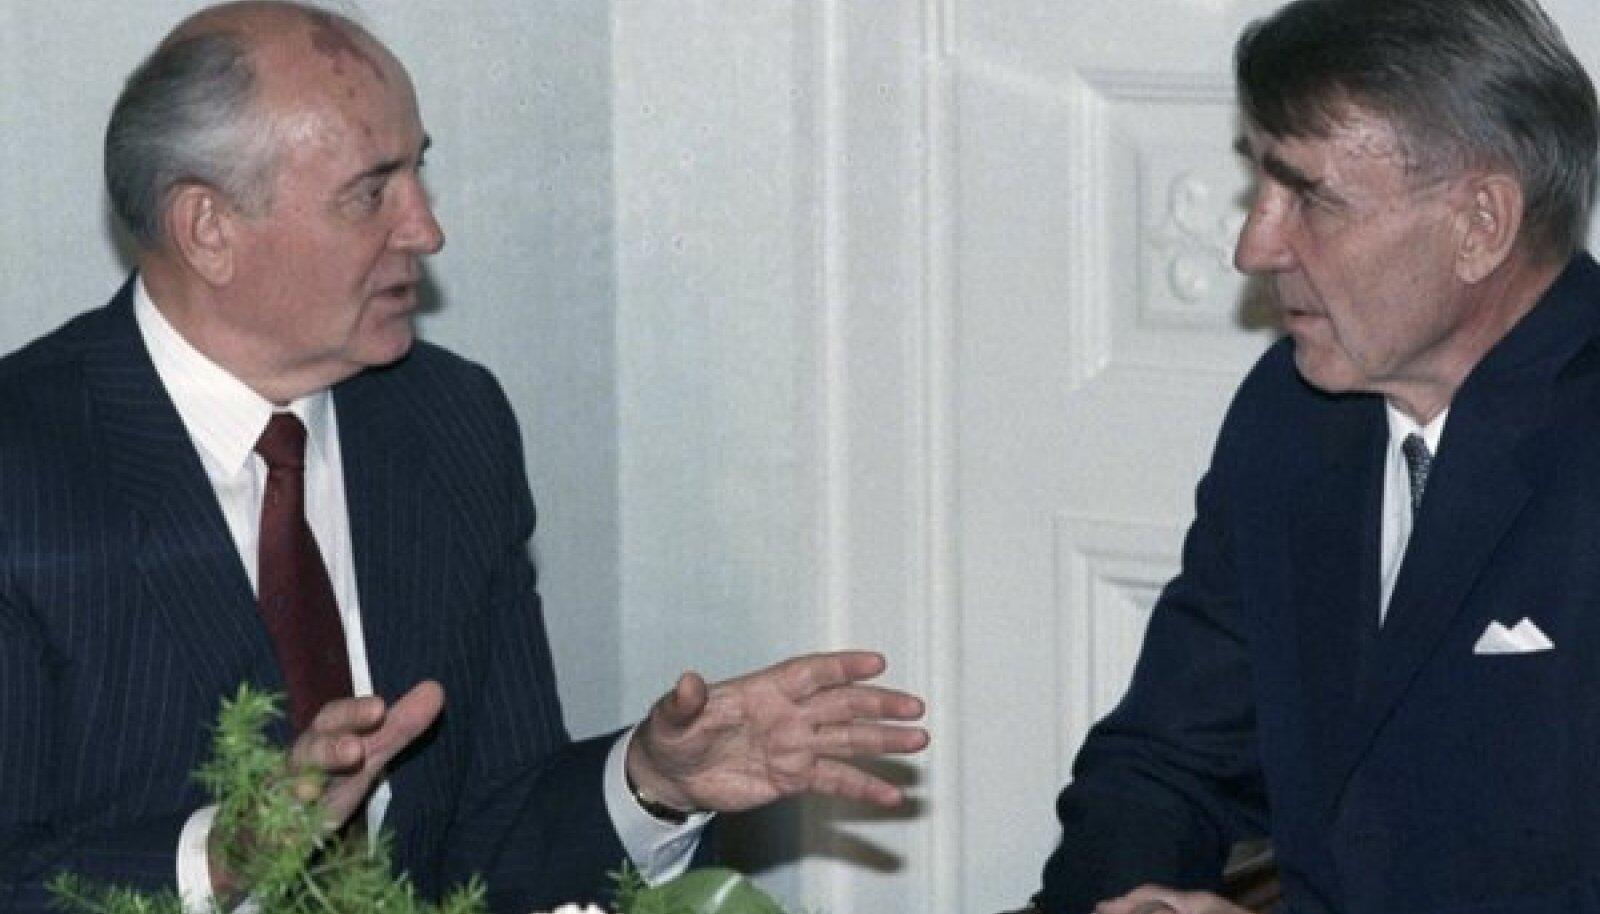 Mihhail Gorbatšov ja Mauno Koivisto